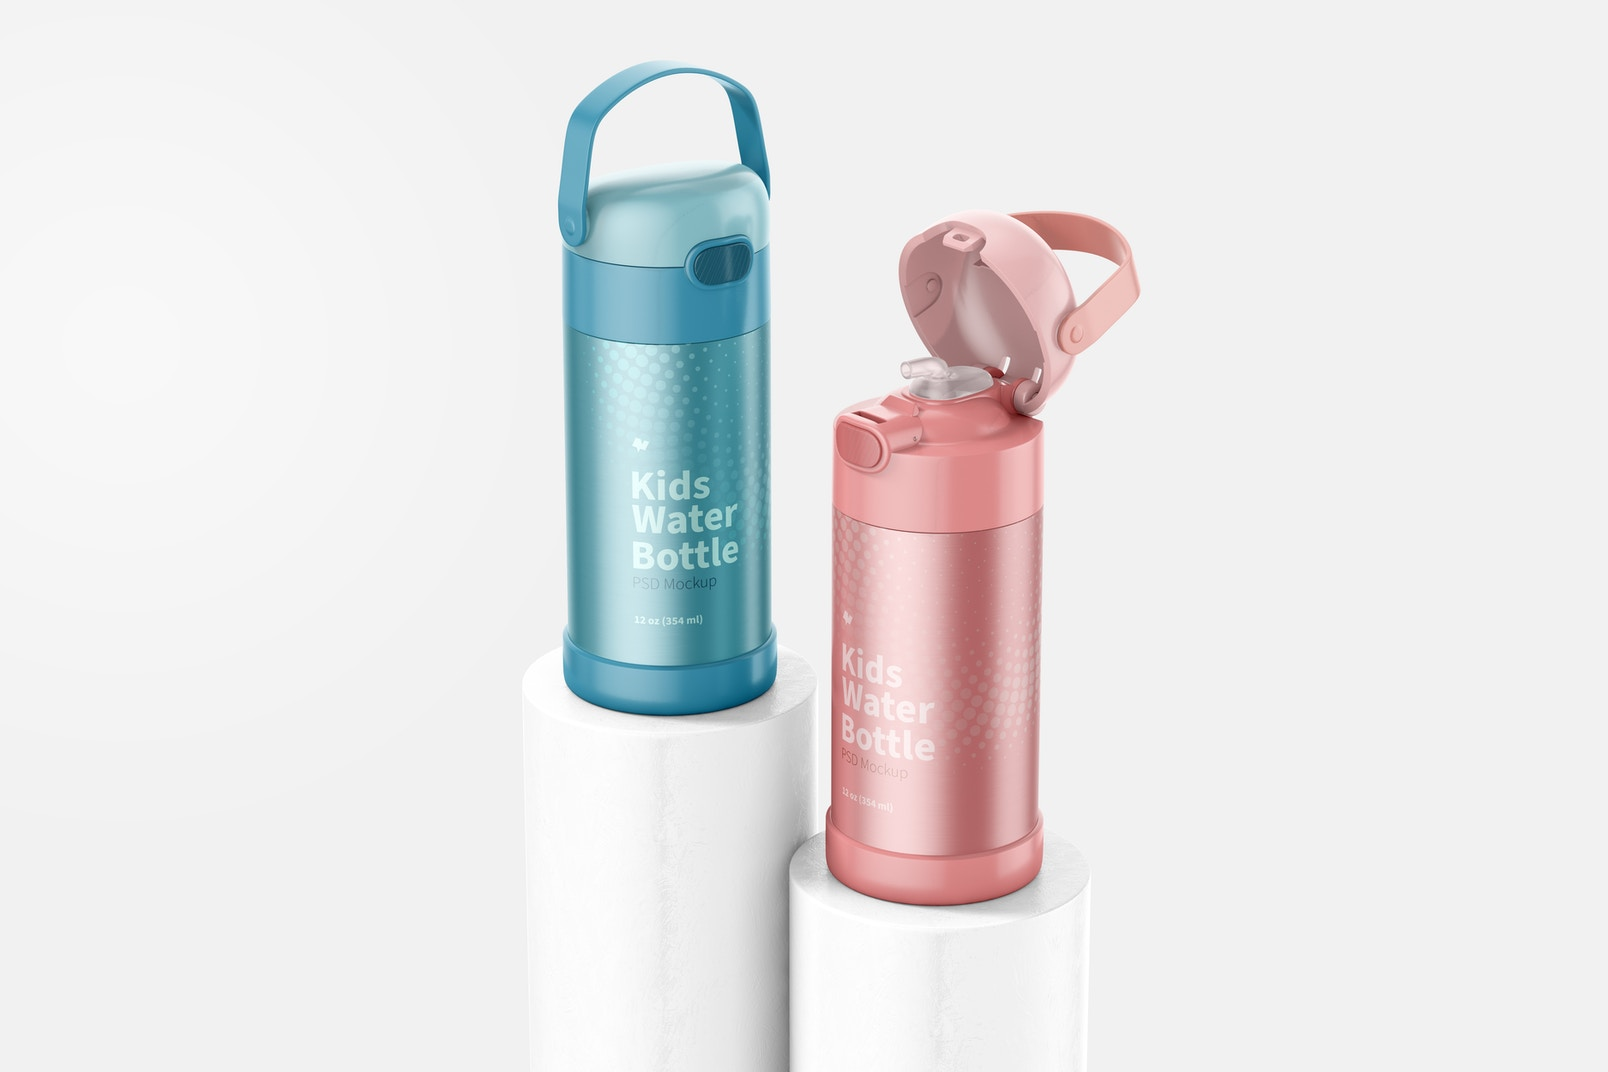 12 oz Kids Water Bottles Mockup